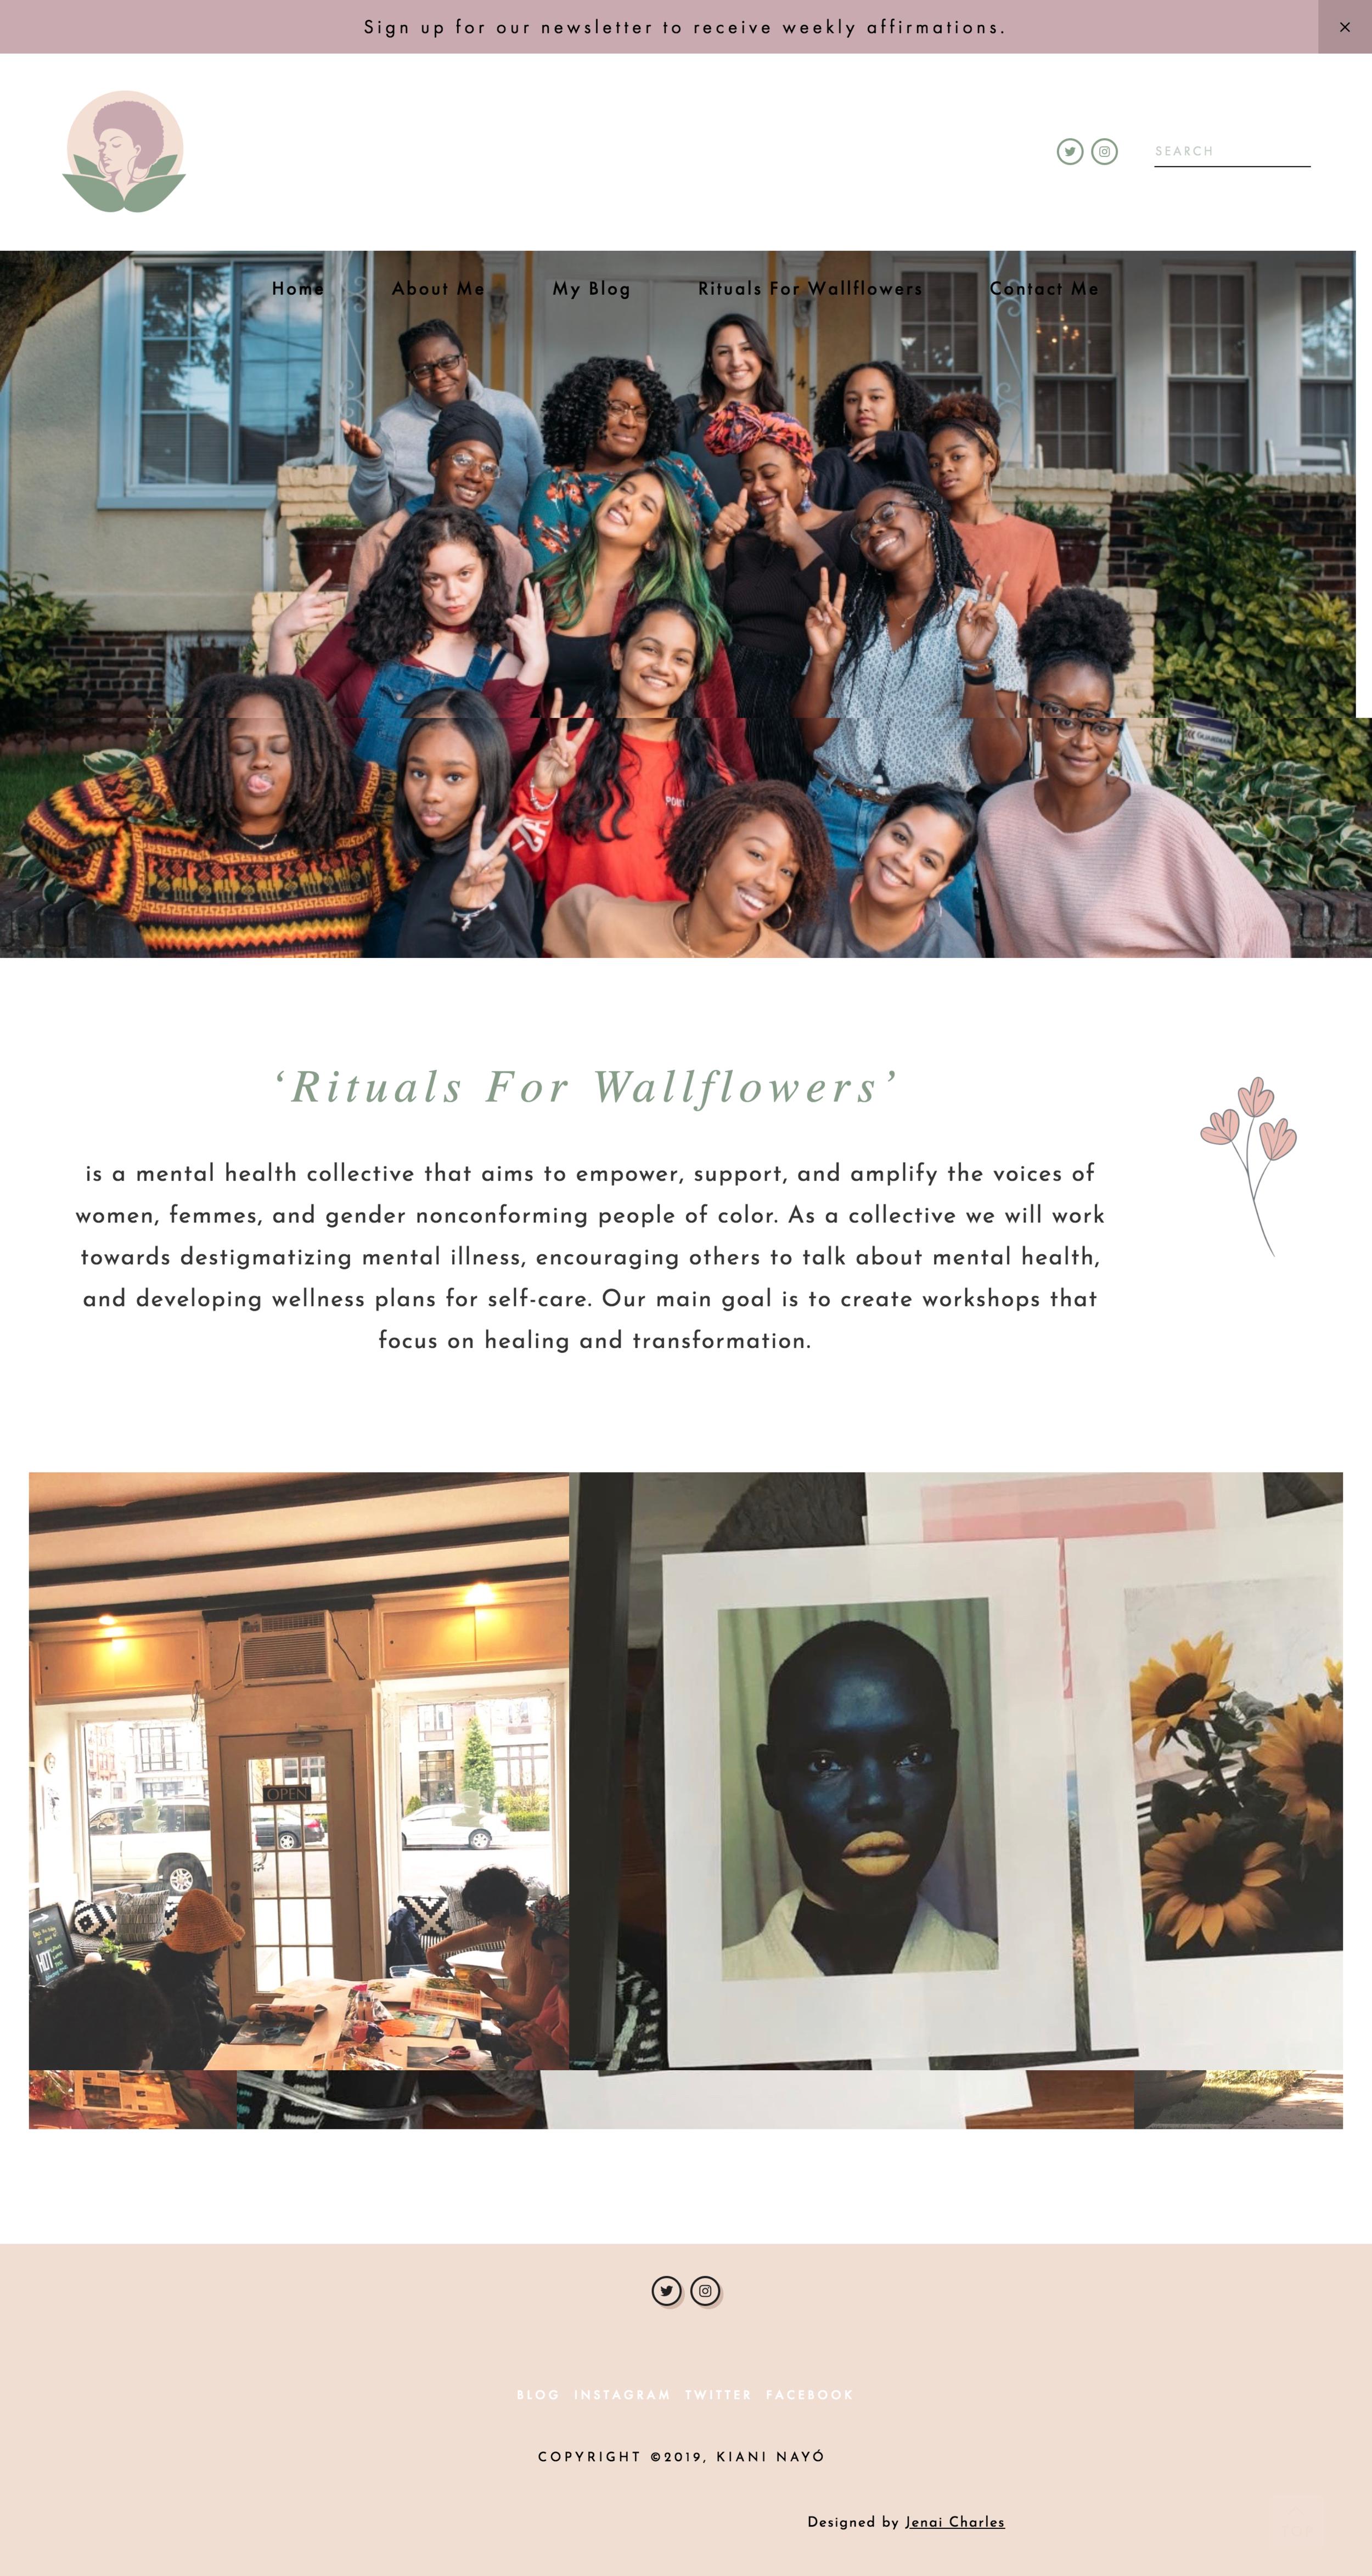 screencapture-kianinayo-rituals-for-wallflowers-2019-06-12-07_58_57 (1).png